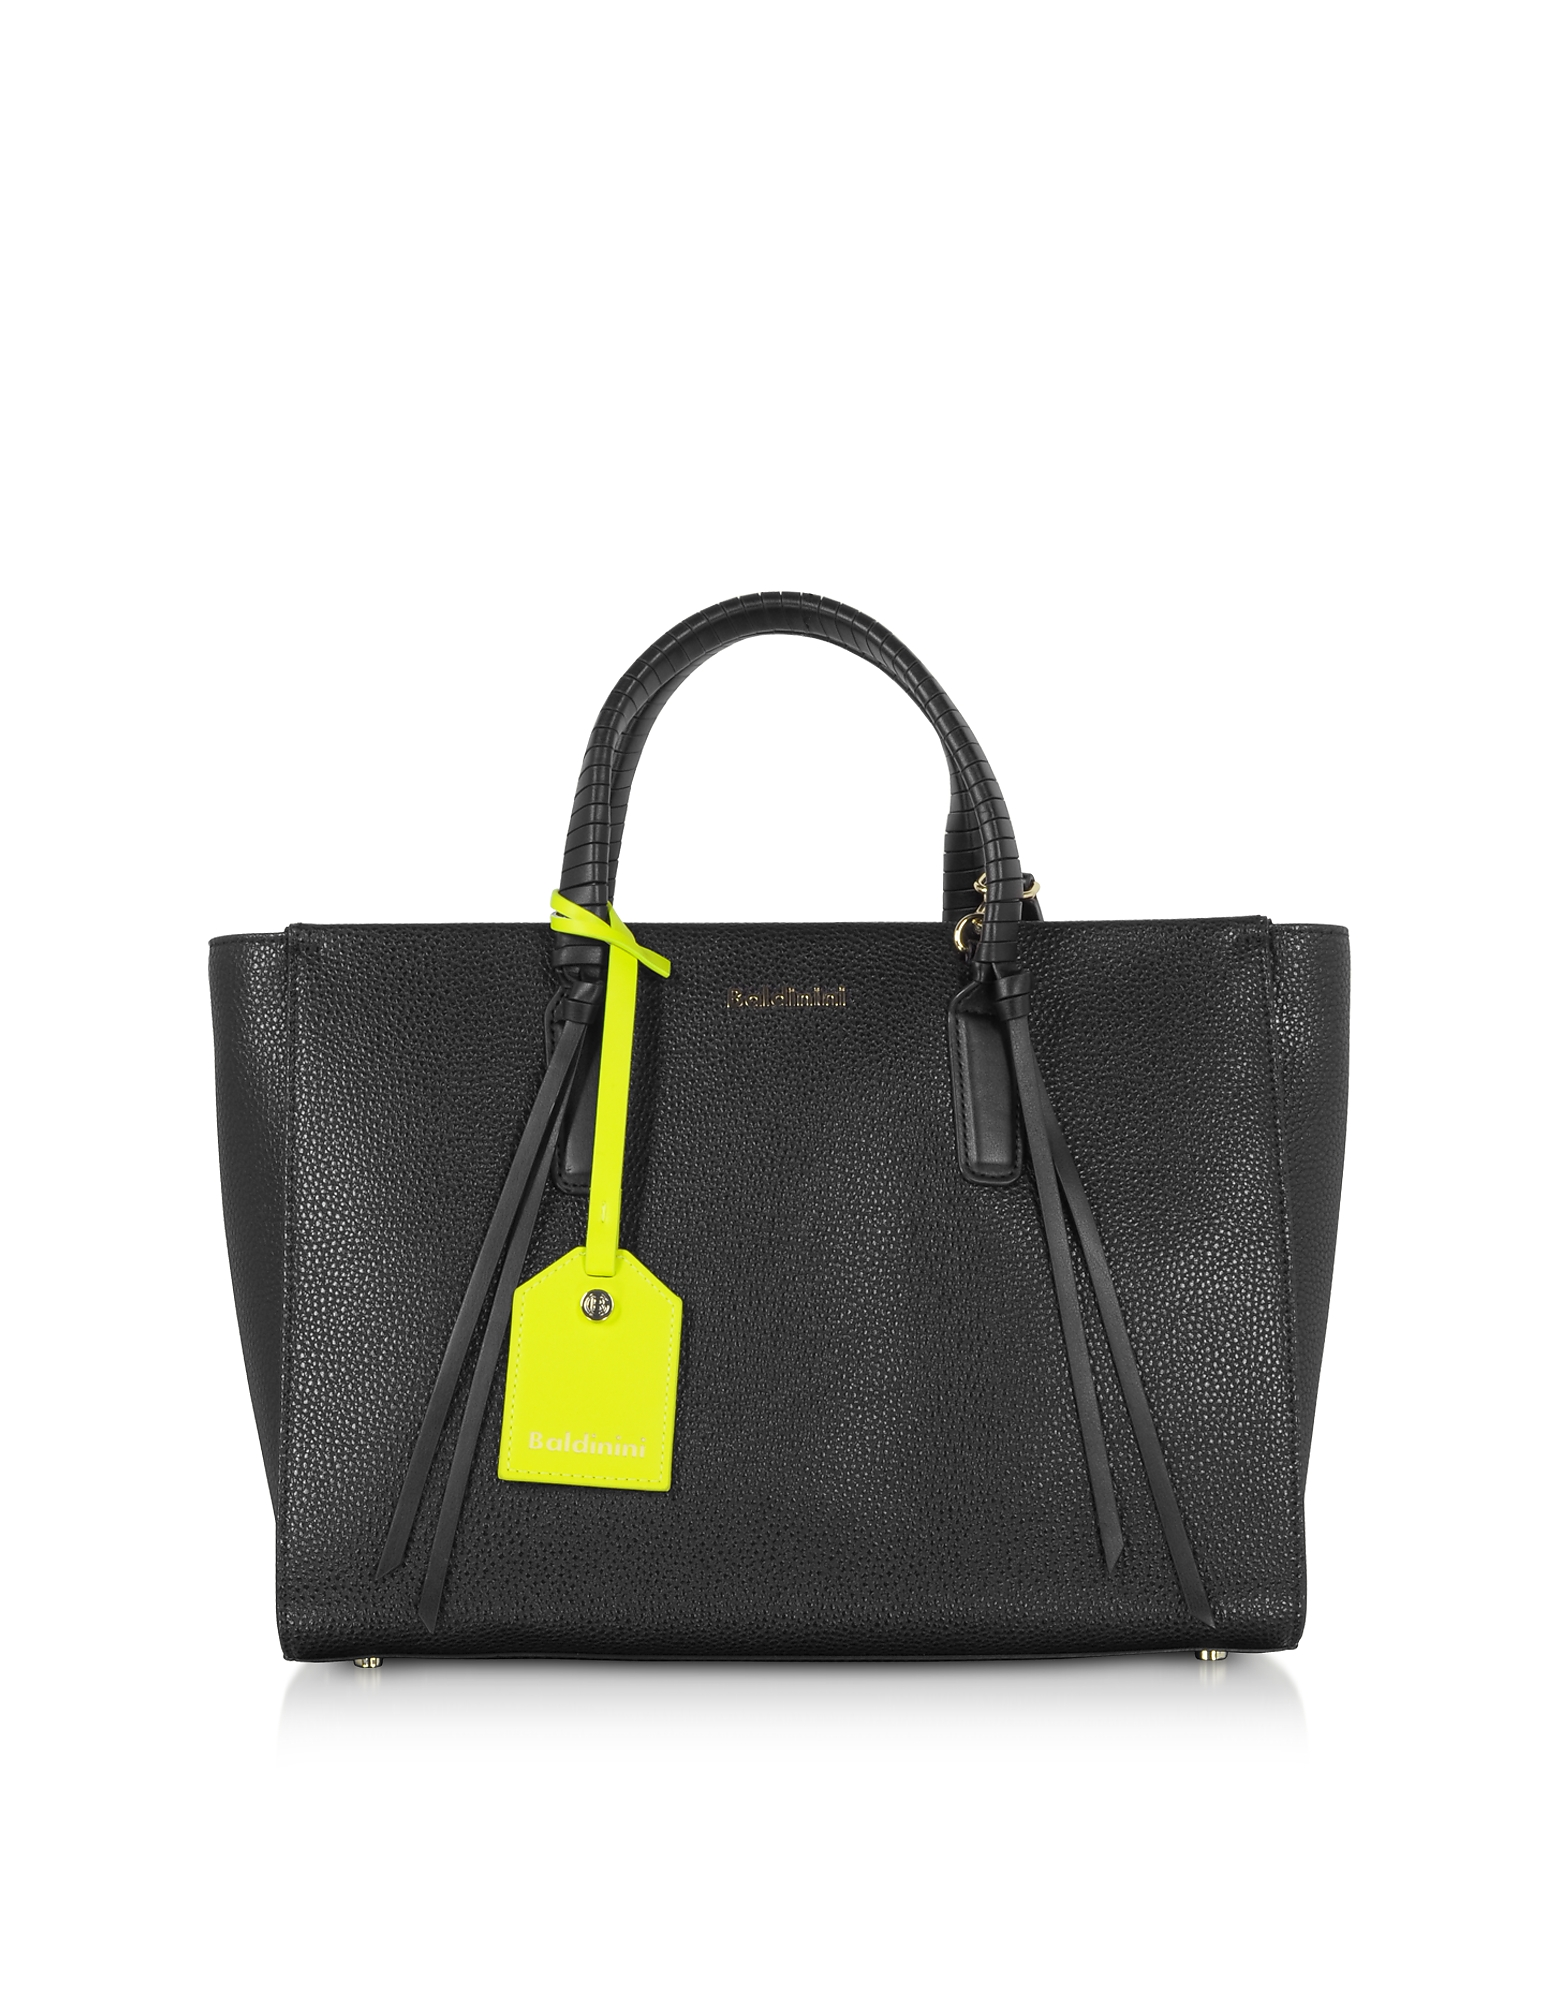 Baldinini Designer Handbags, Daisy Black Leather Tote Bag